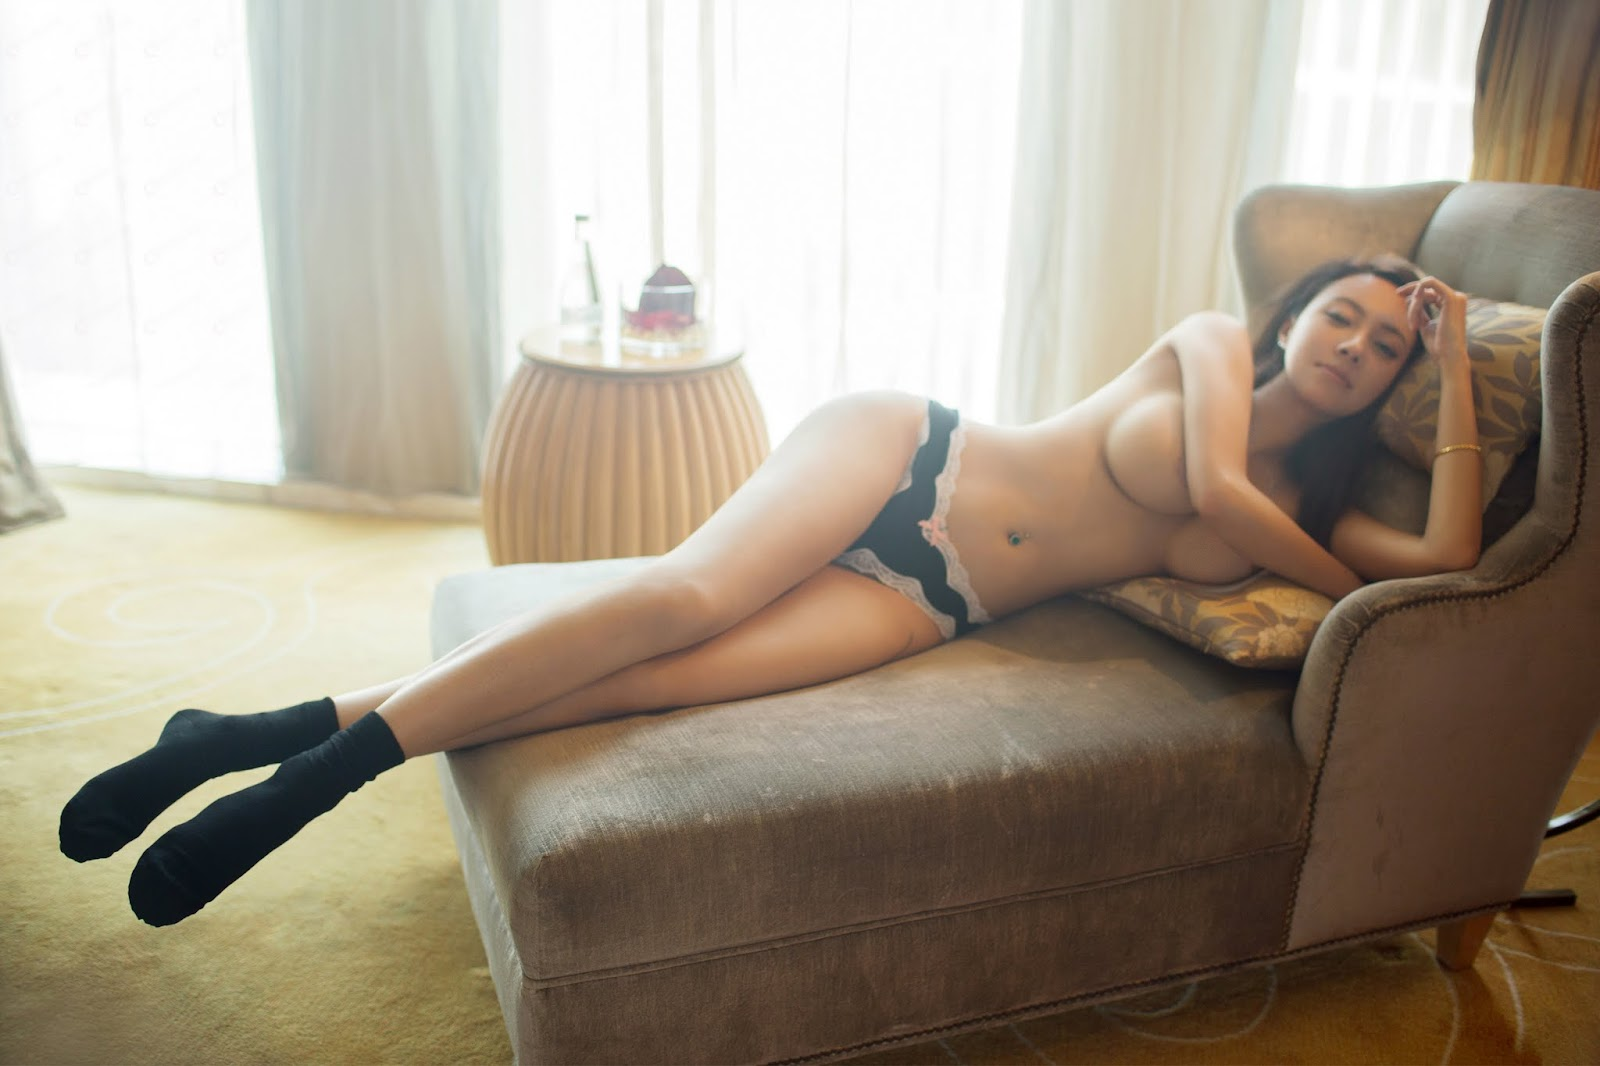 %252B%25C2%25A6v%25C2%25A6%25C2%25B7 35 meitu 10 - Sexy Girl Model TUIGIRL NO.58